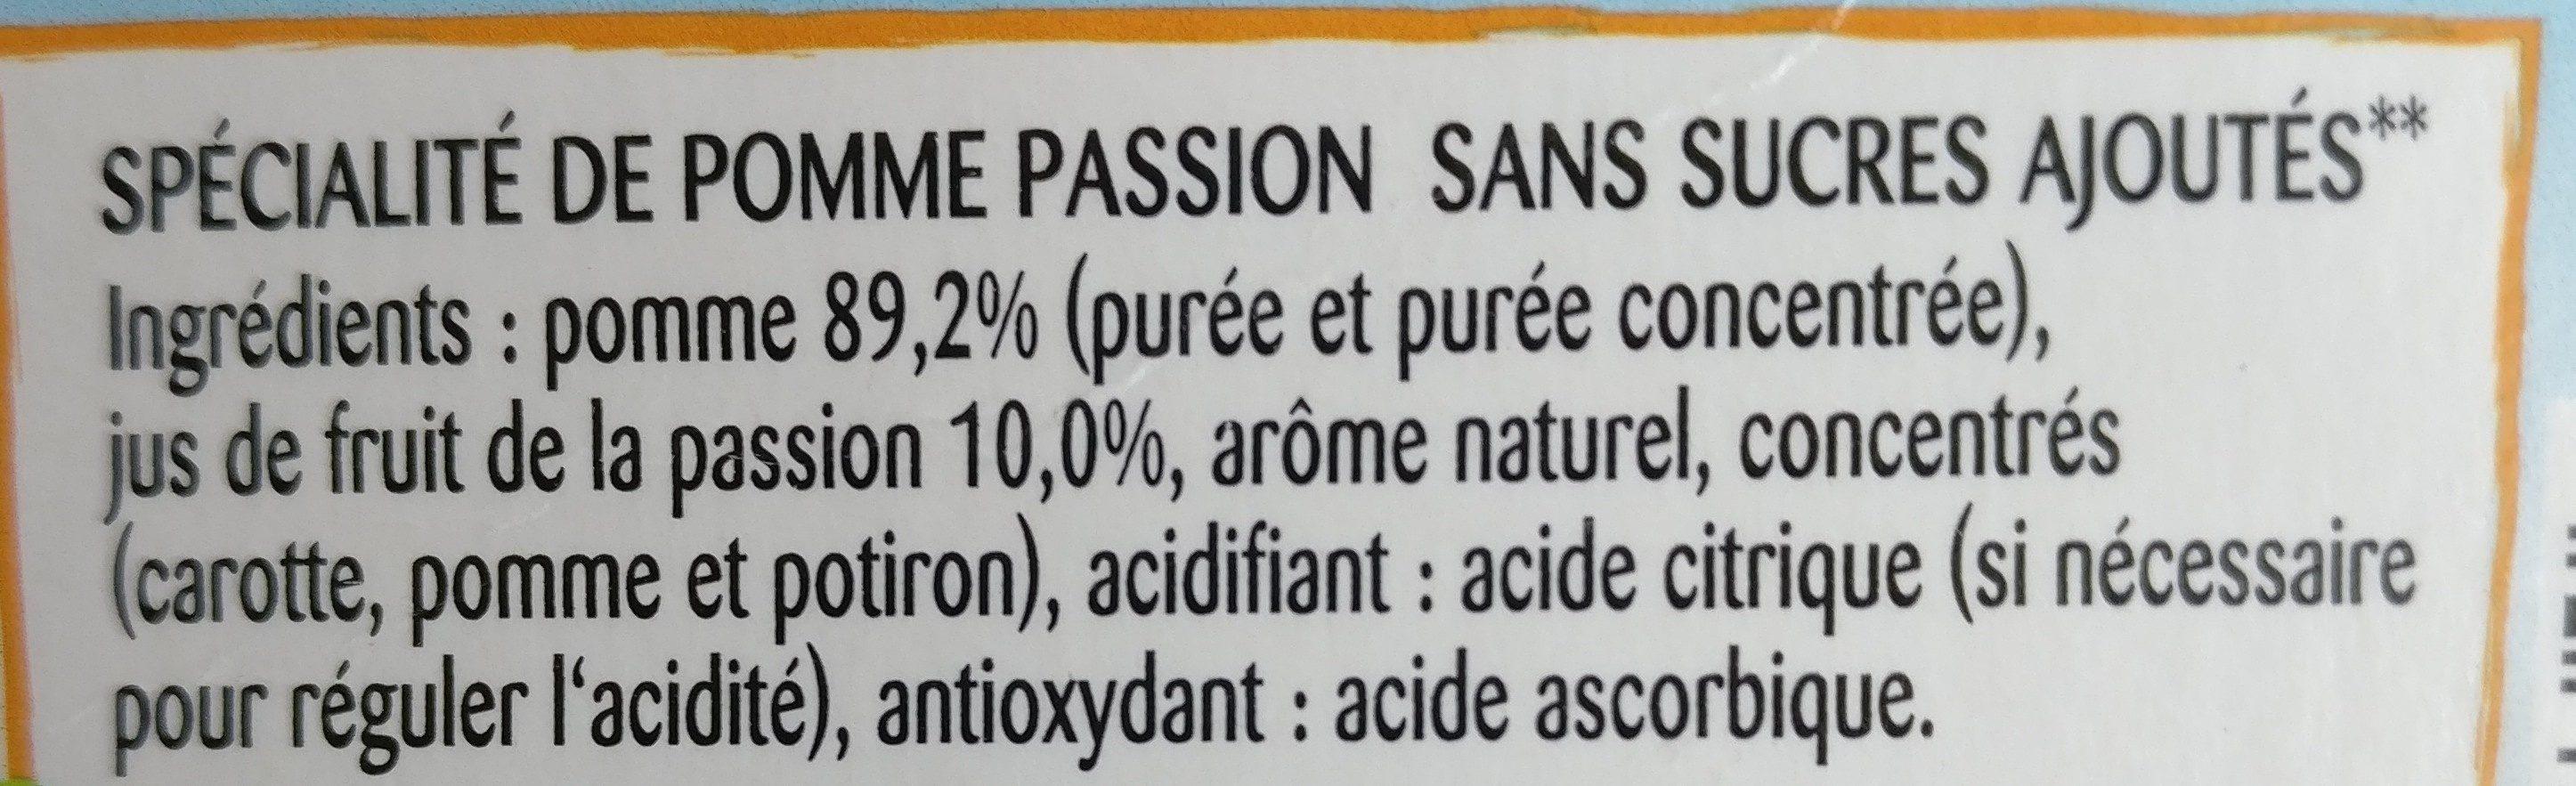 Pomme Passion - Ingrediënten - fr